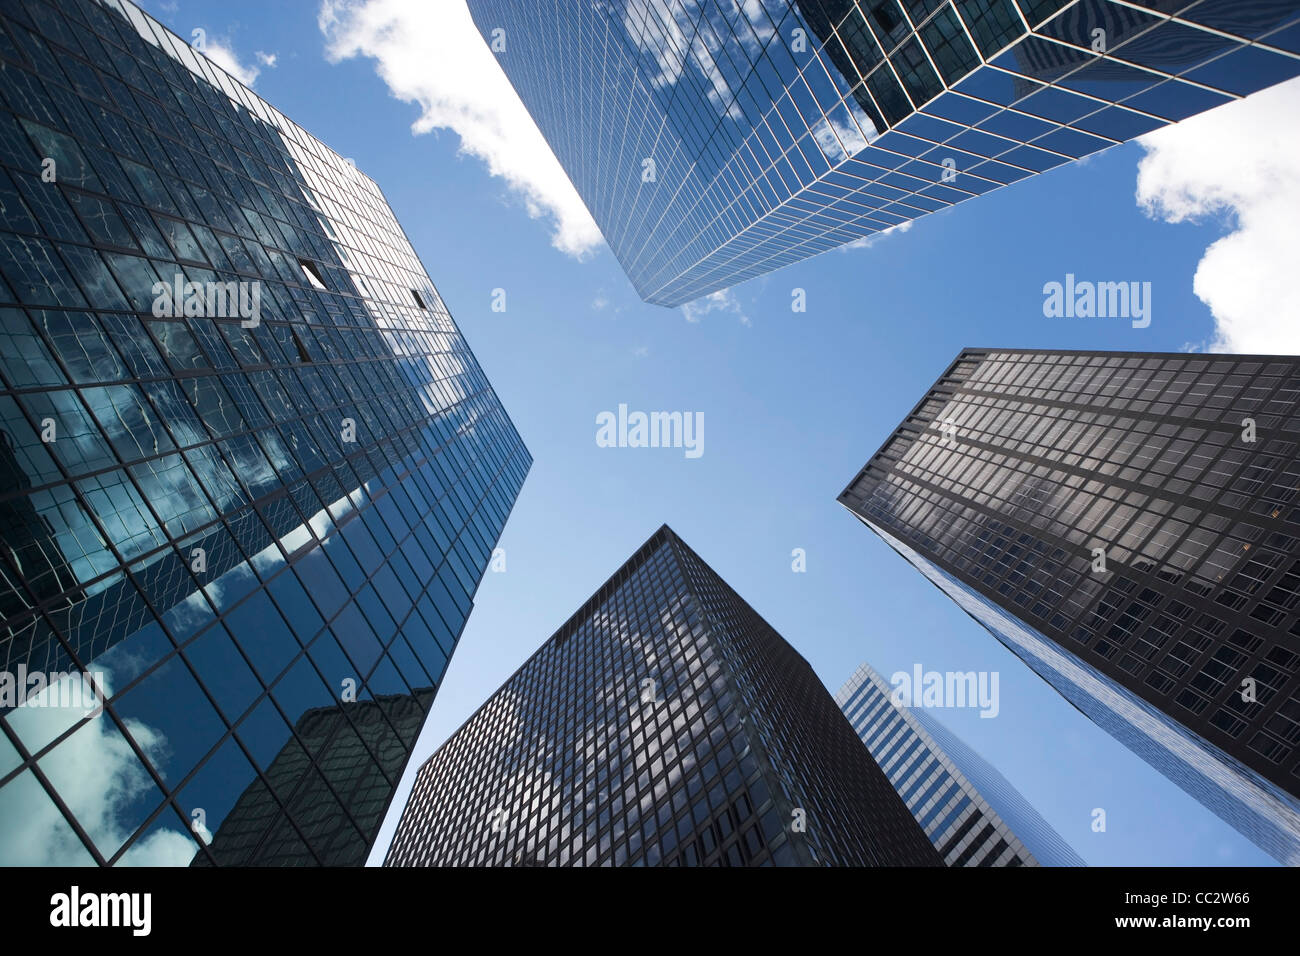 USA, New York State, New York City, modernen Bürogebäuden Stockbild